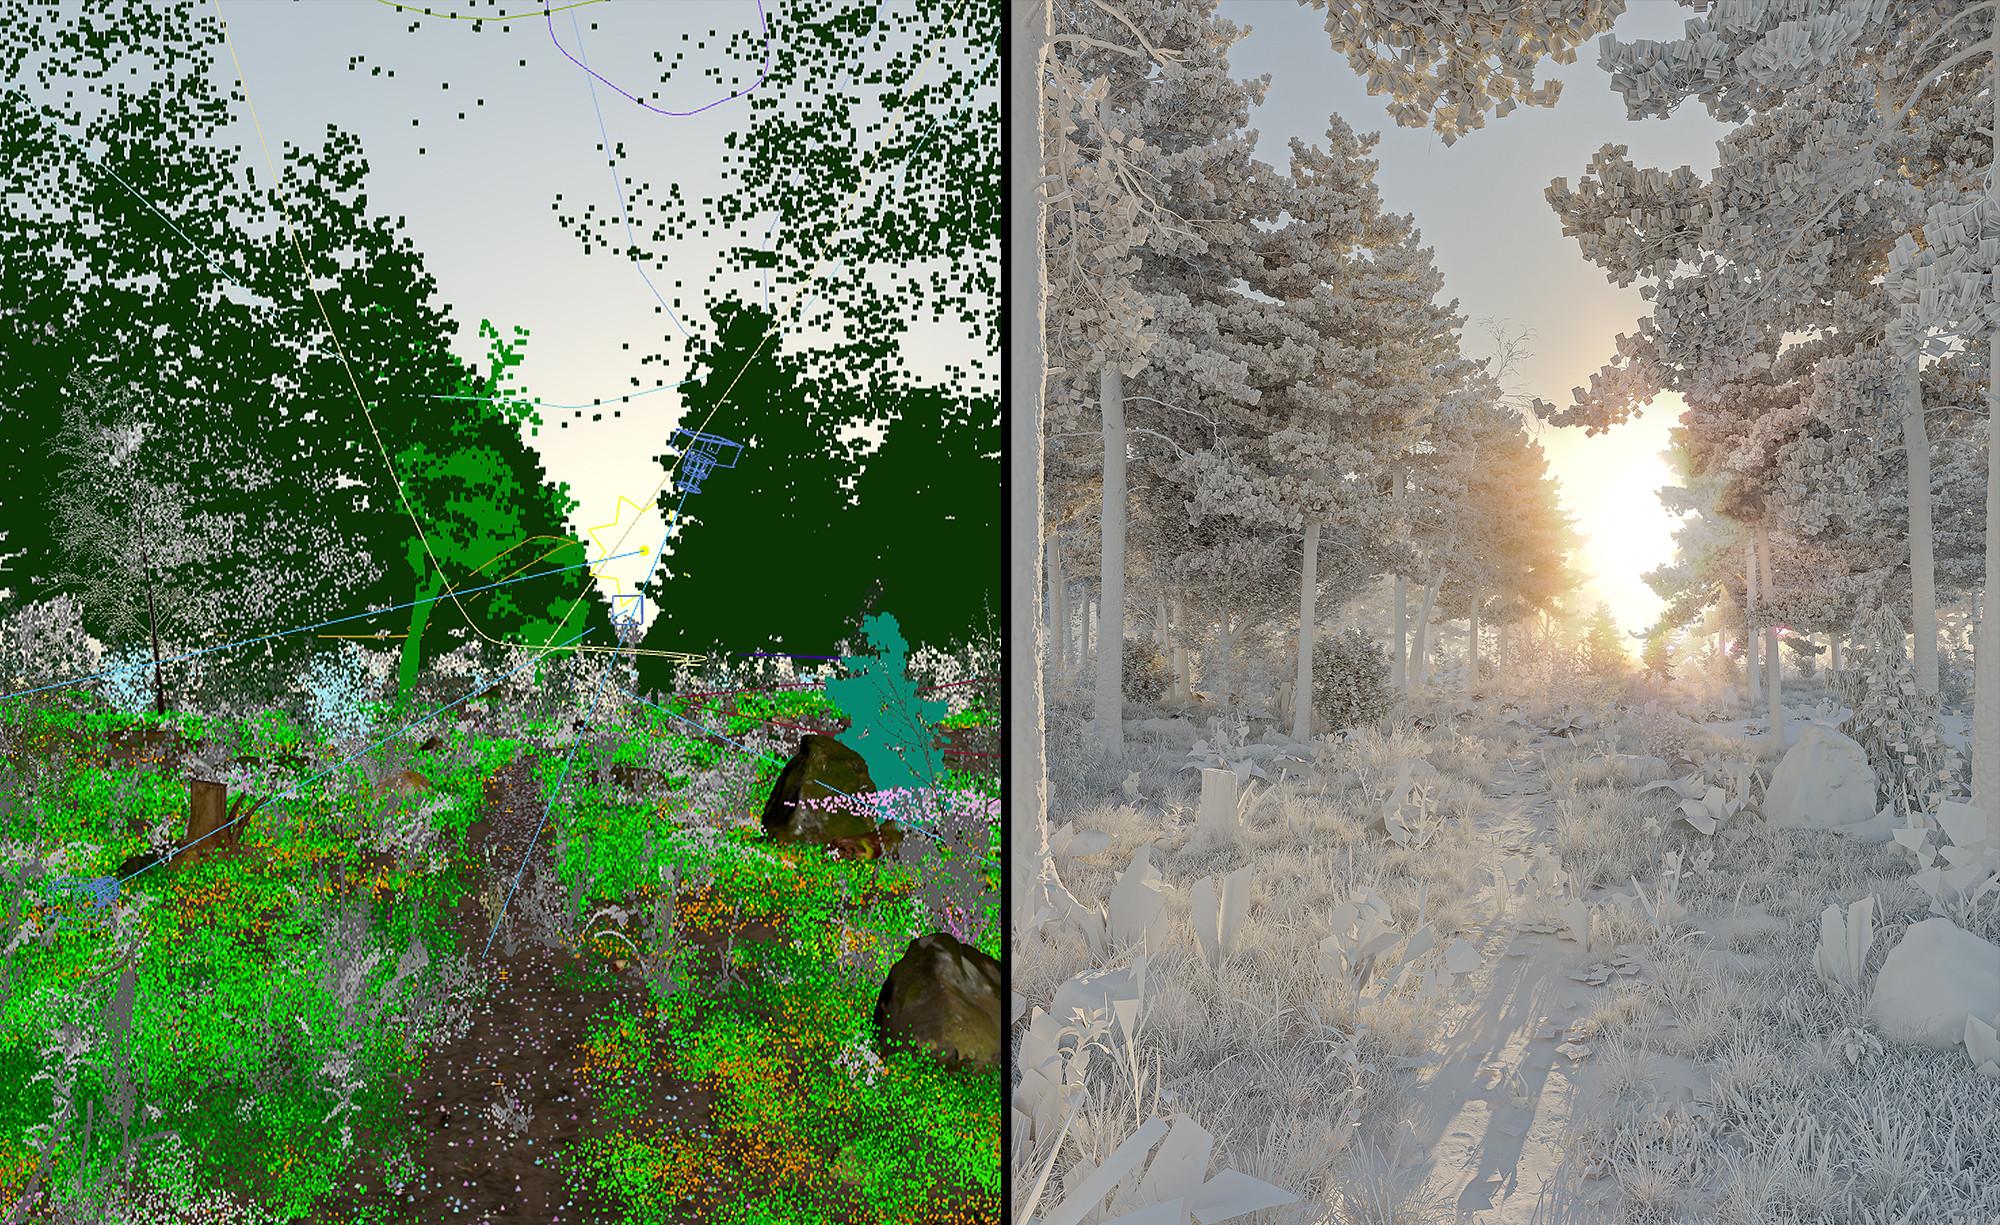 3DSMAX Viewport + Clay Render